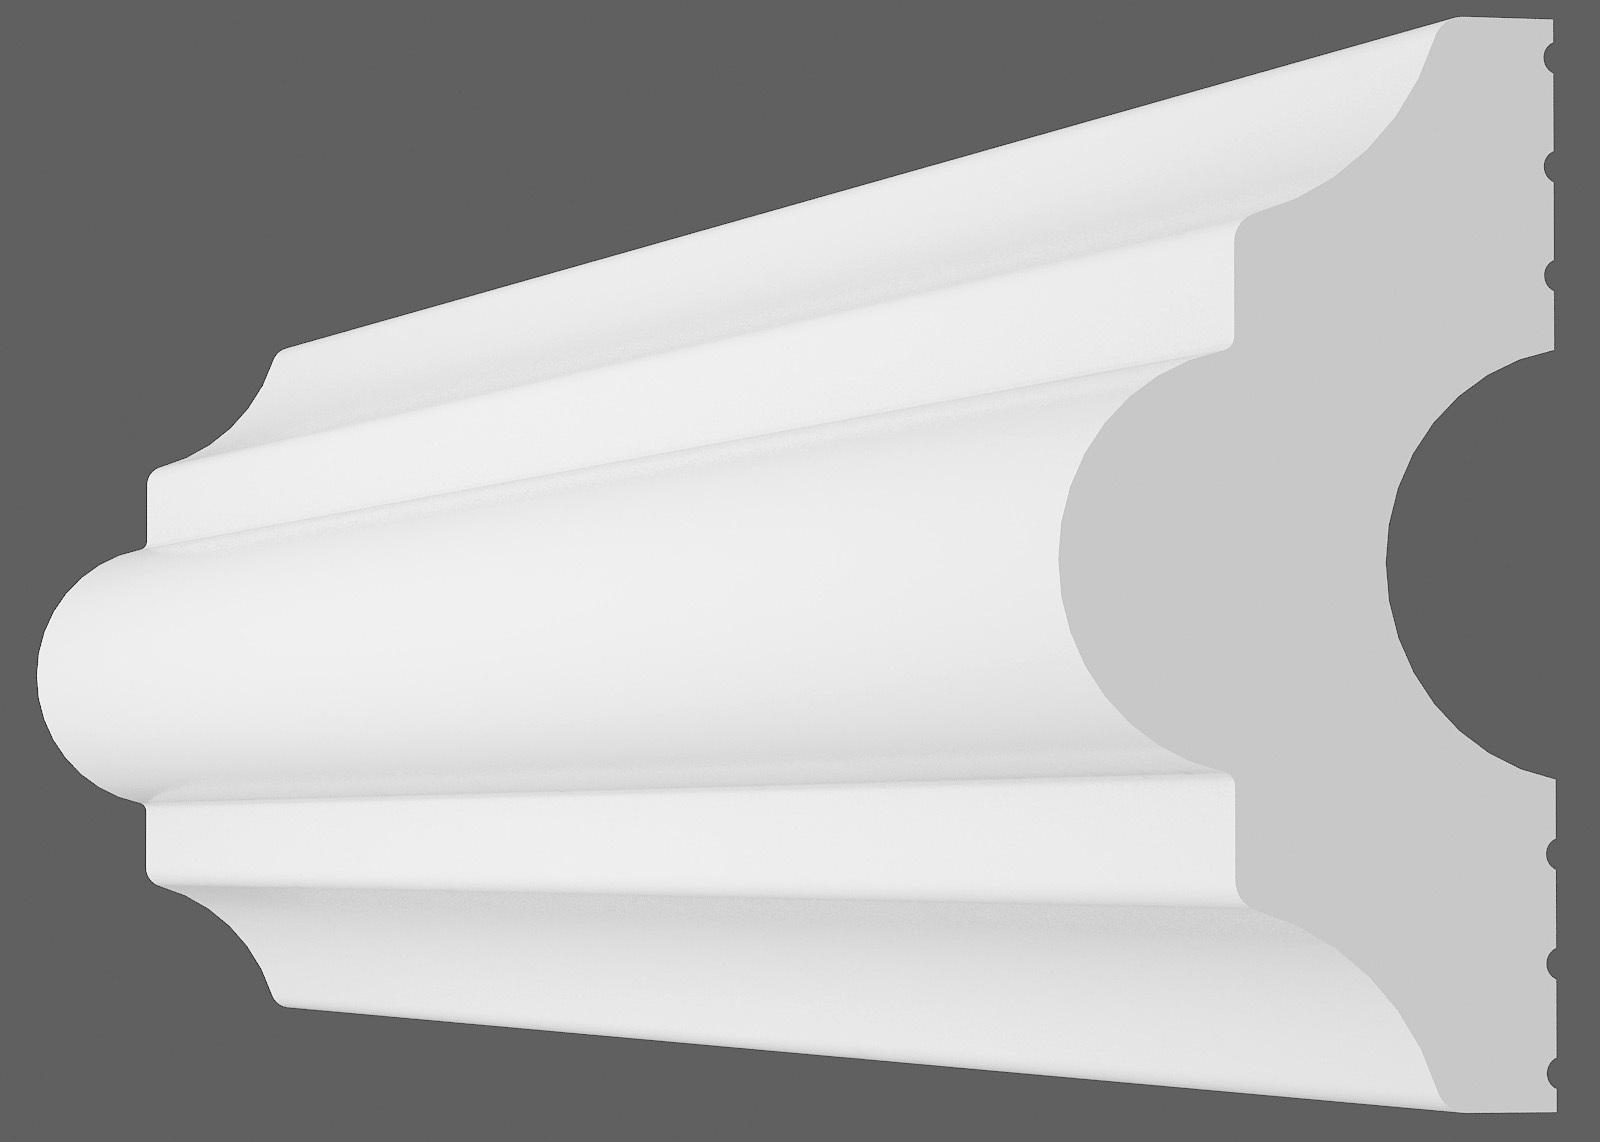 Потолочный плинтус I-40 (Размер:15х40мм)